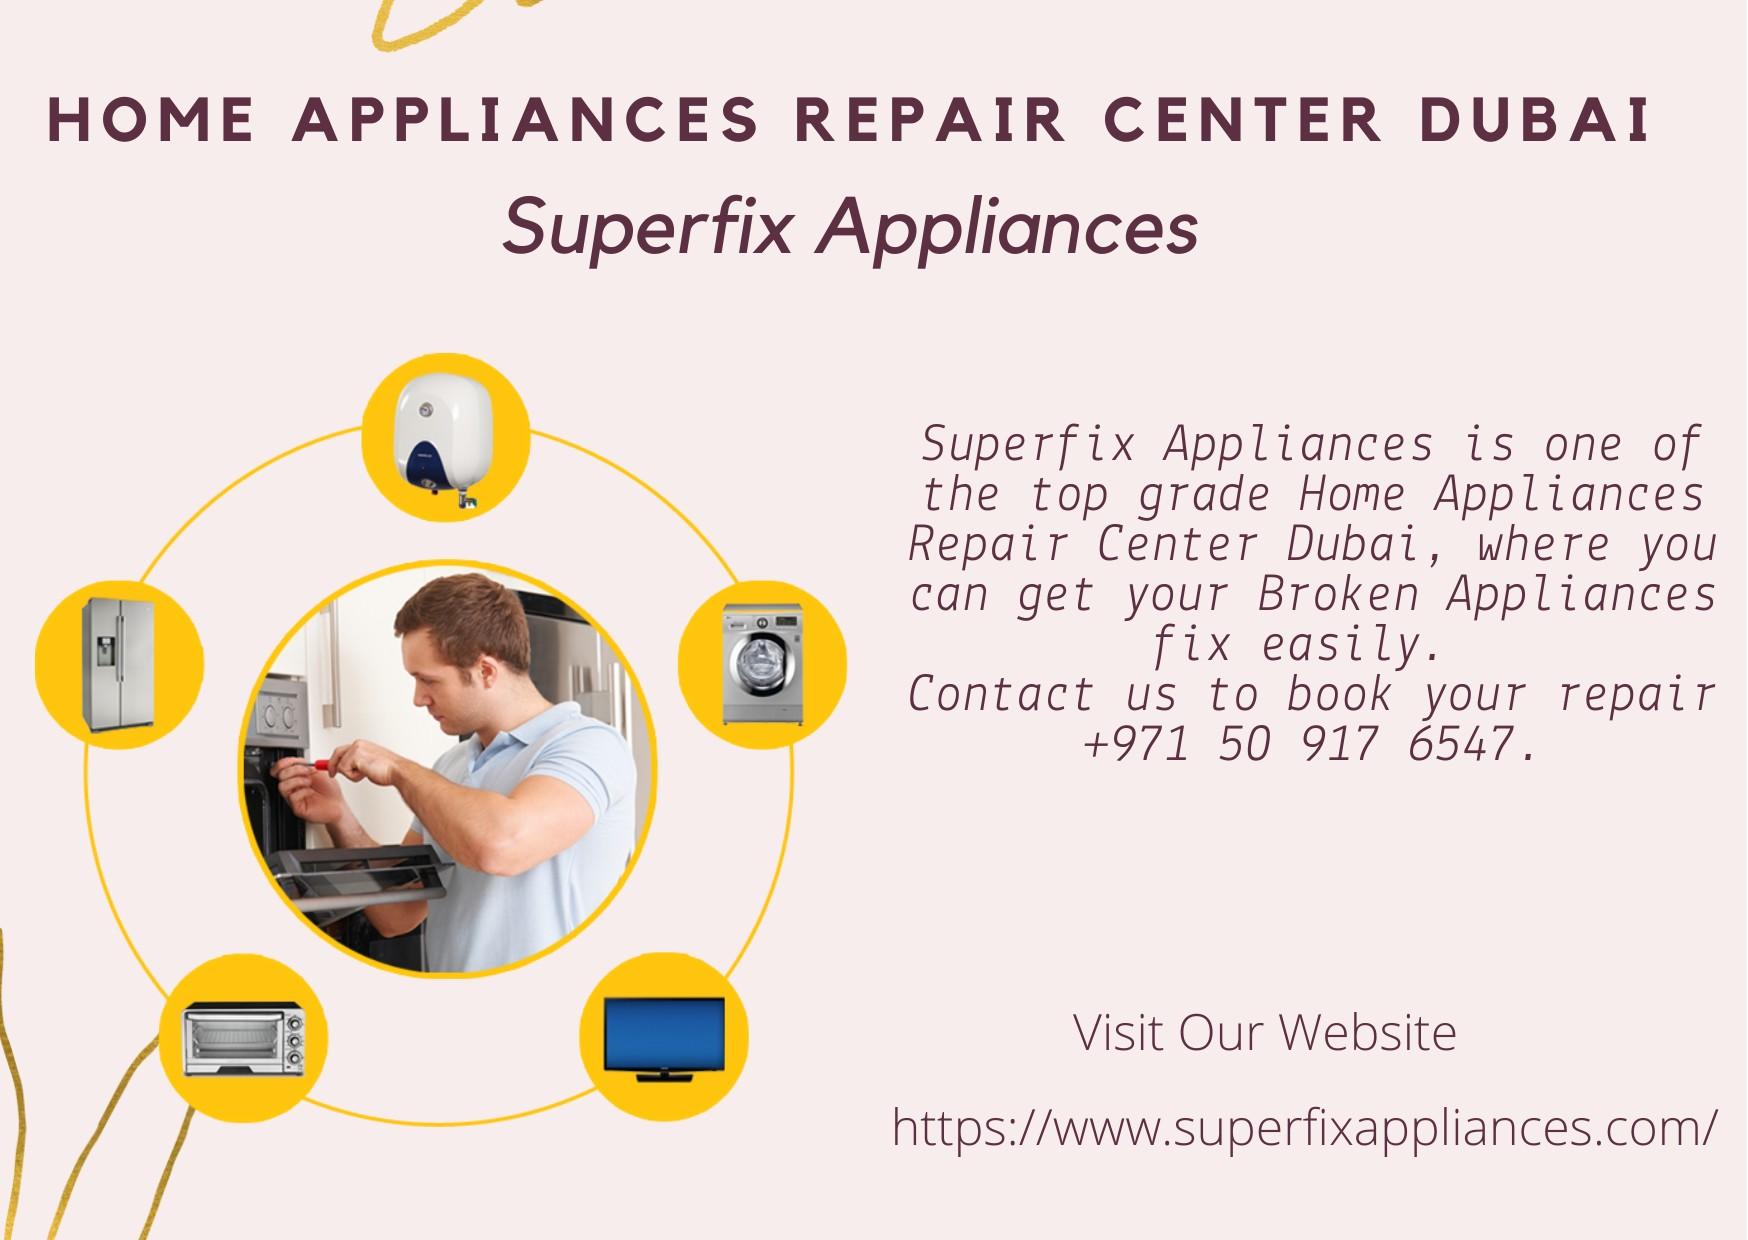 Home Appliances Repair Center Dubai | Superfix - UAE